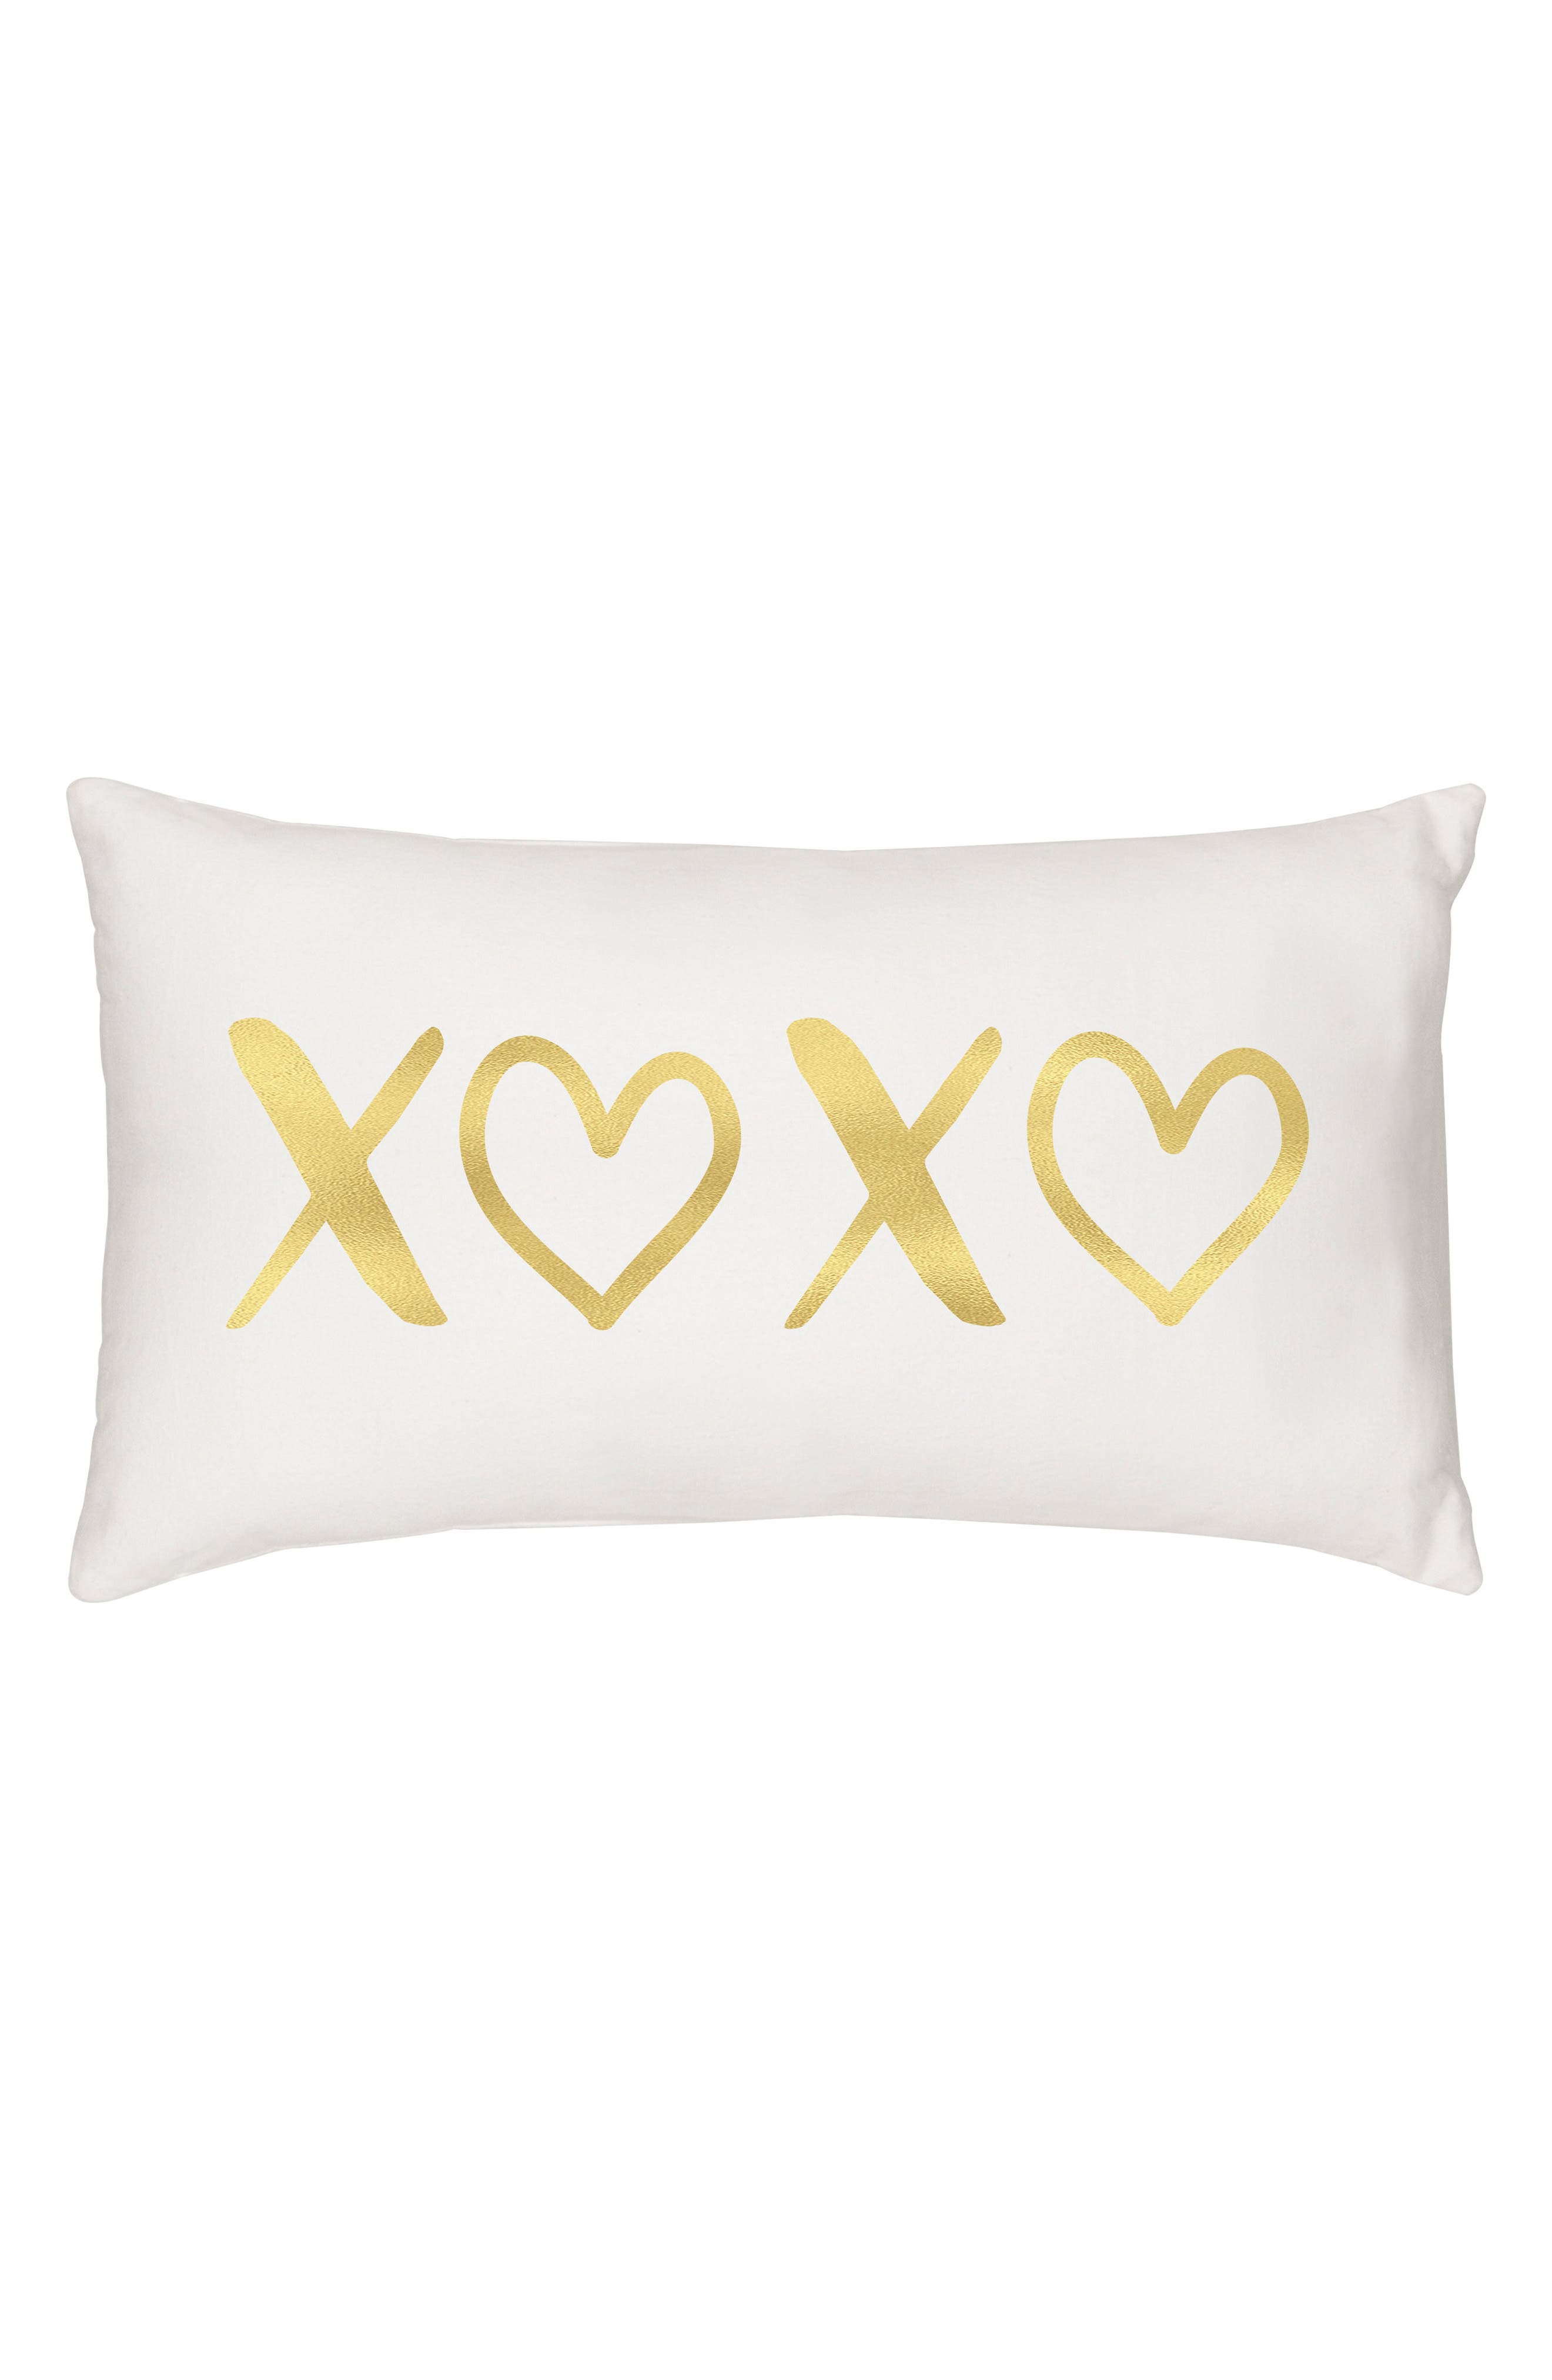 XOXO Accent Pillow,                             Main thumbnail 1, color,                             713